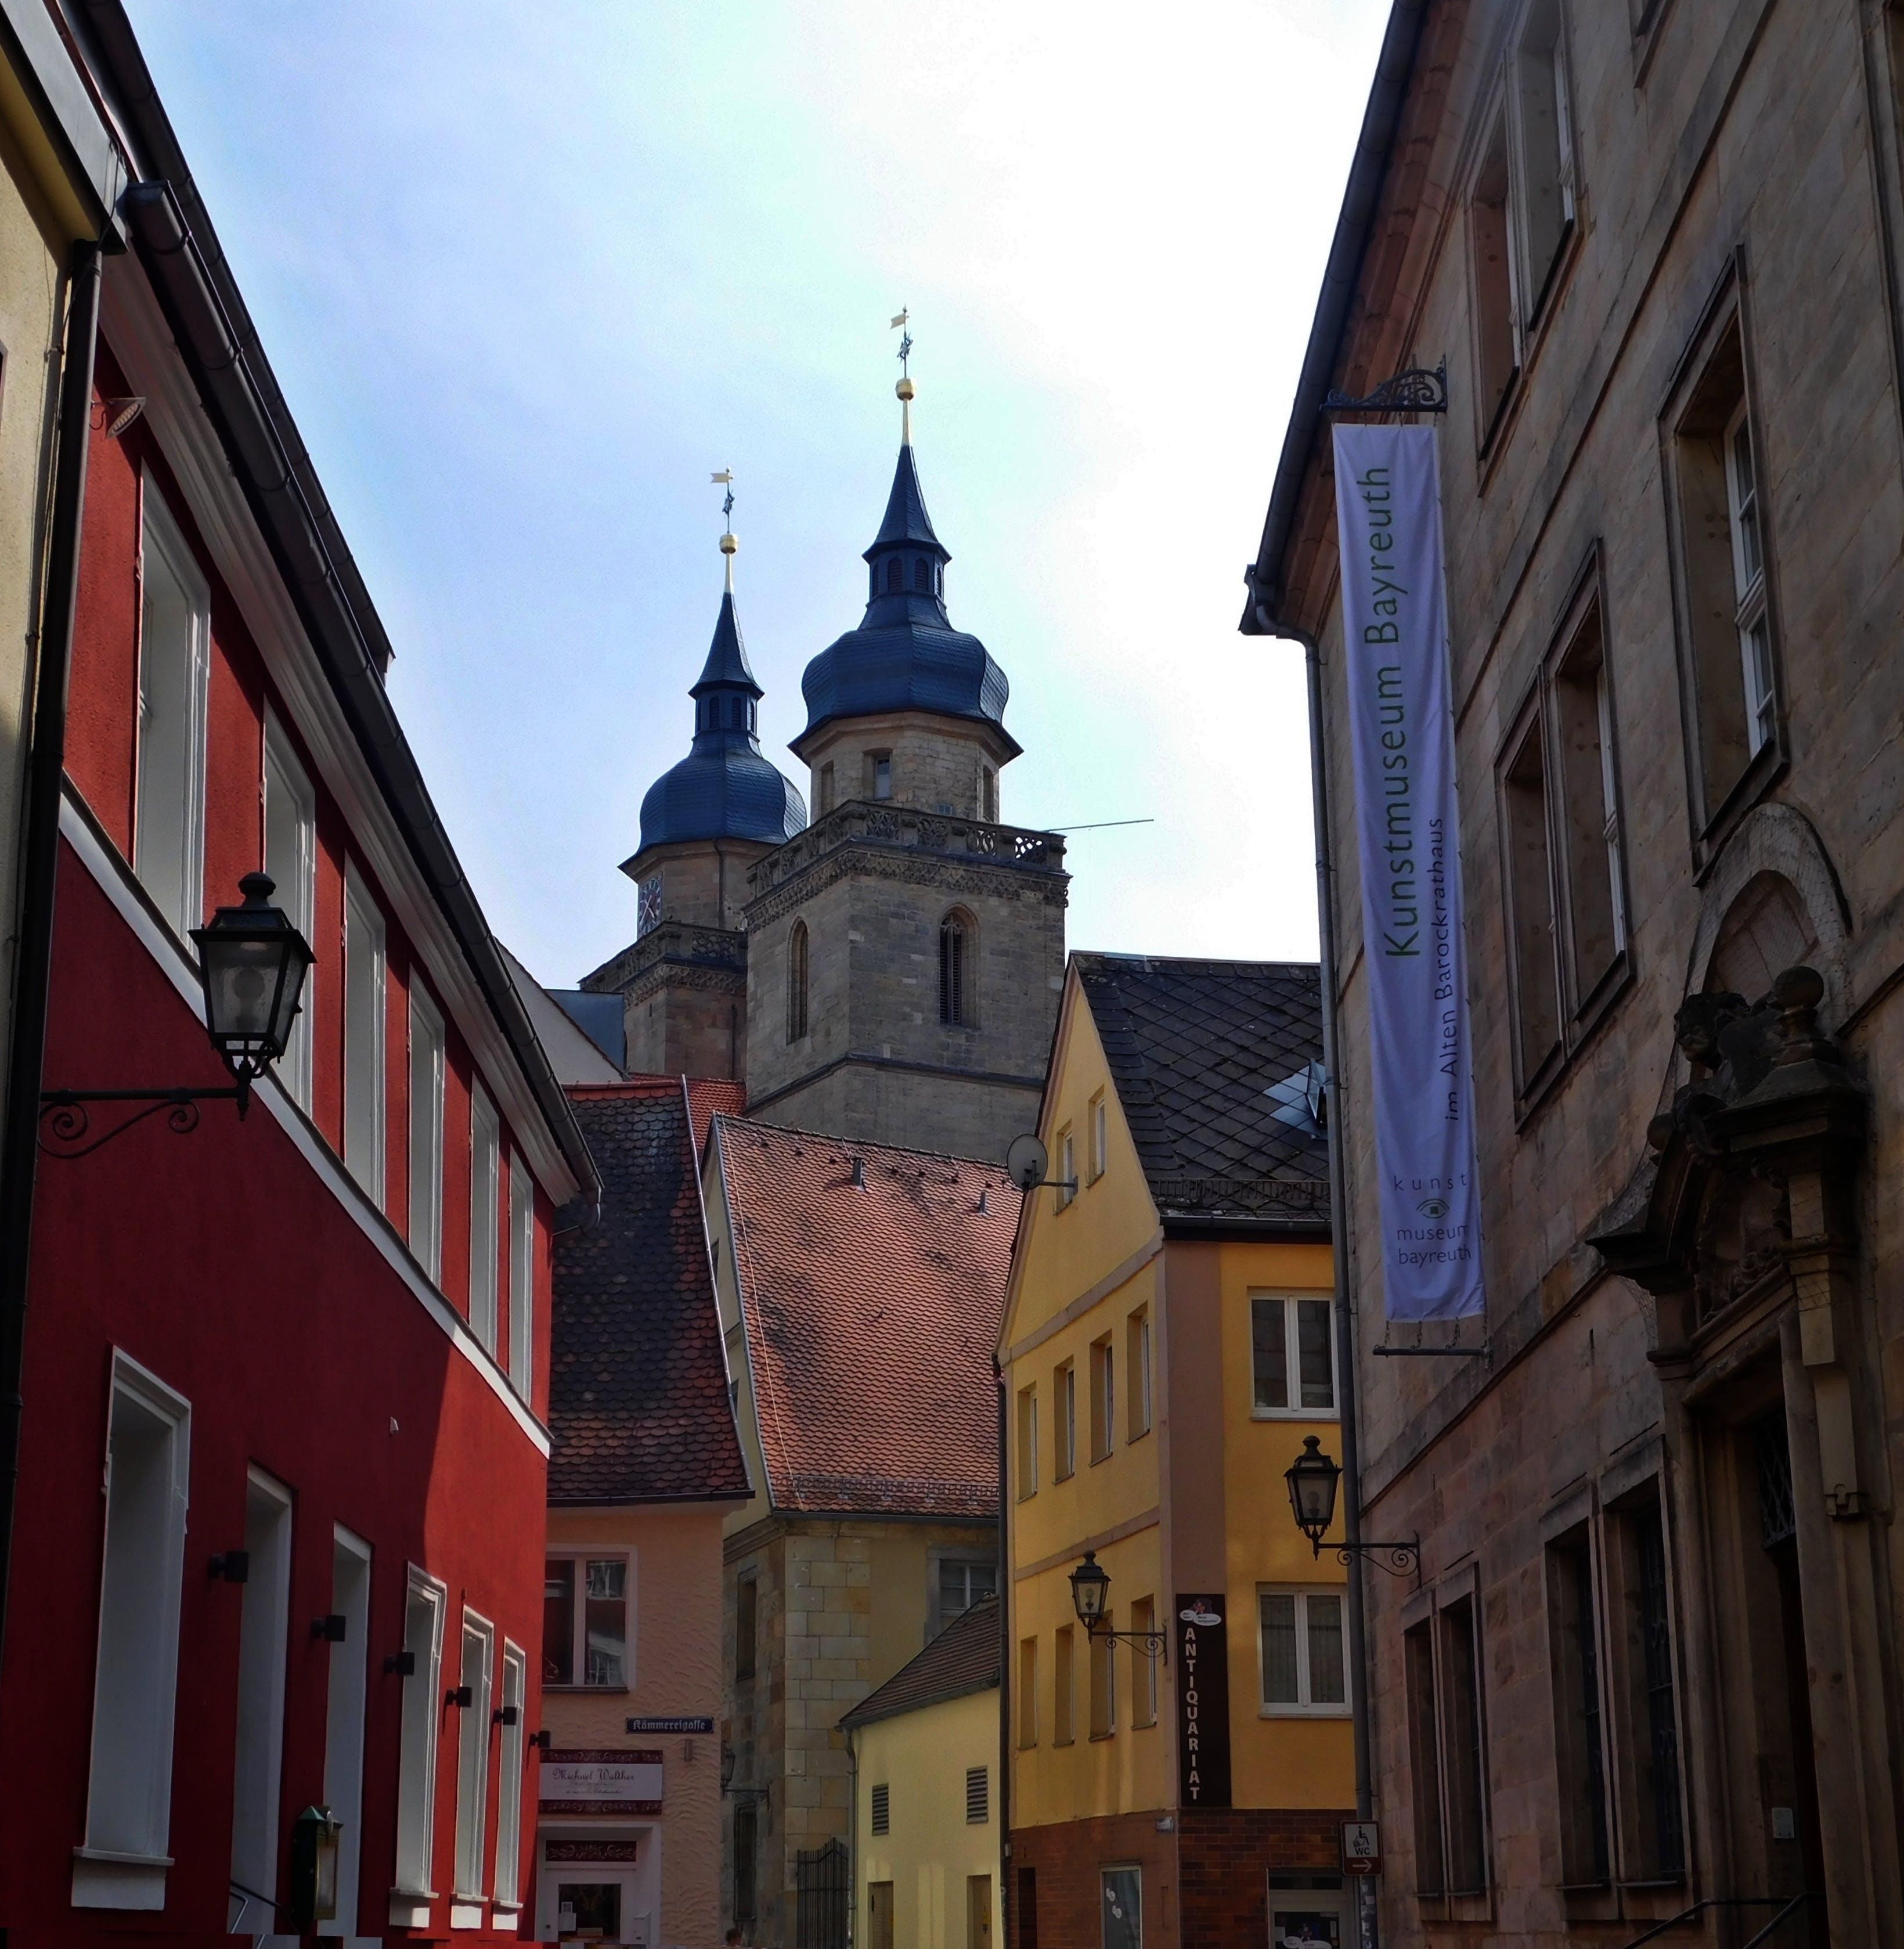 Free stock photo of alley, architecture, backyard, Bavaria